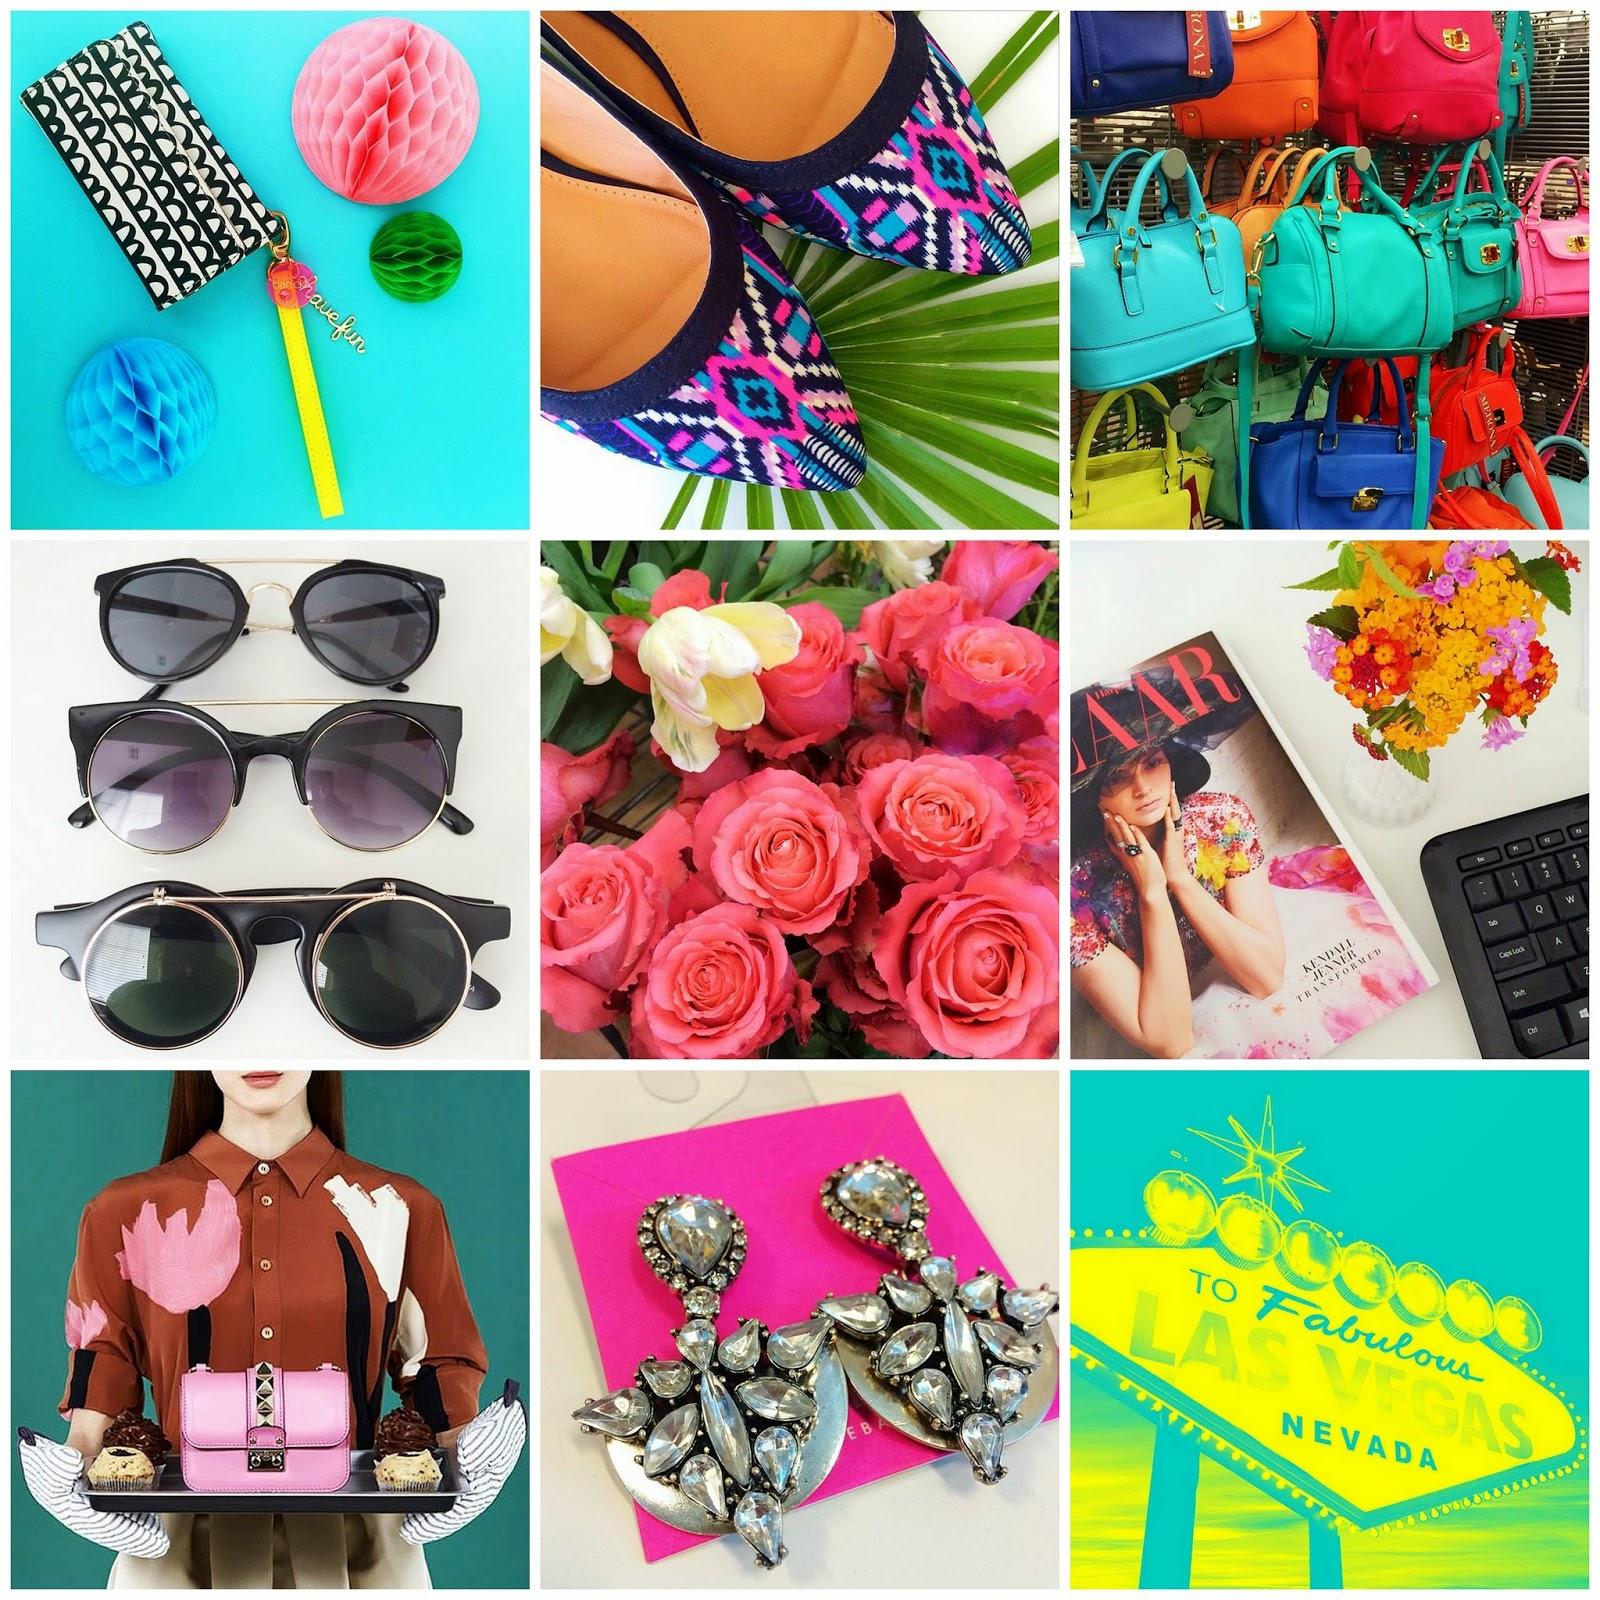 las vegas fashion style blogger instgram content